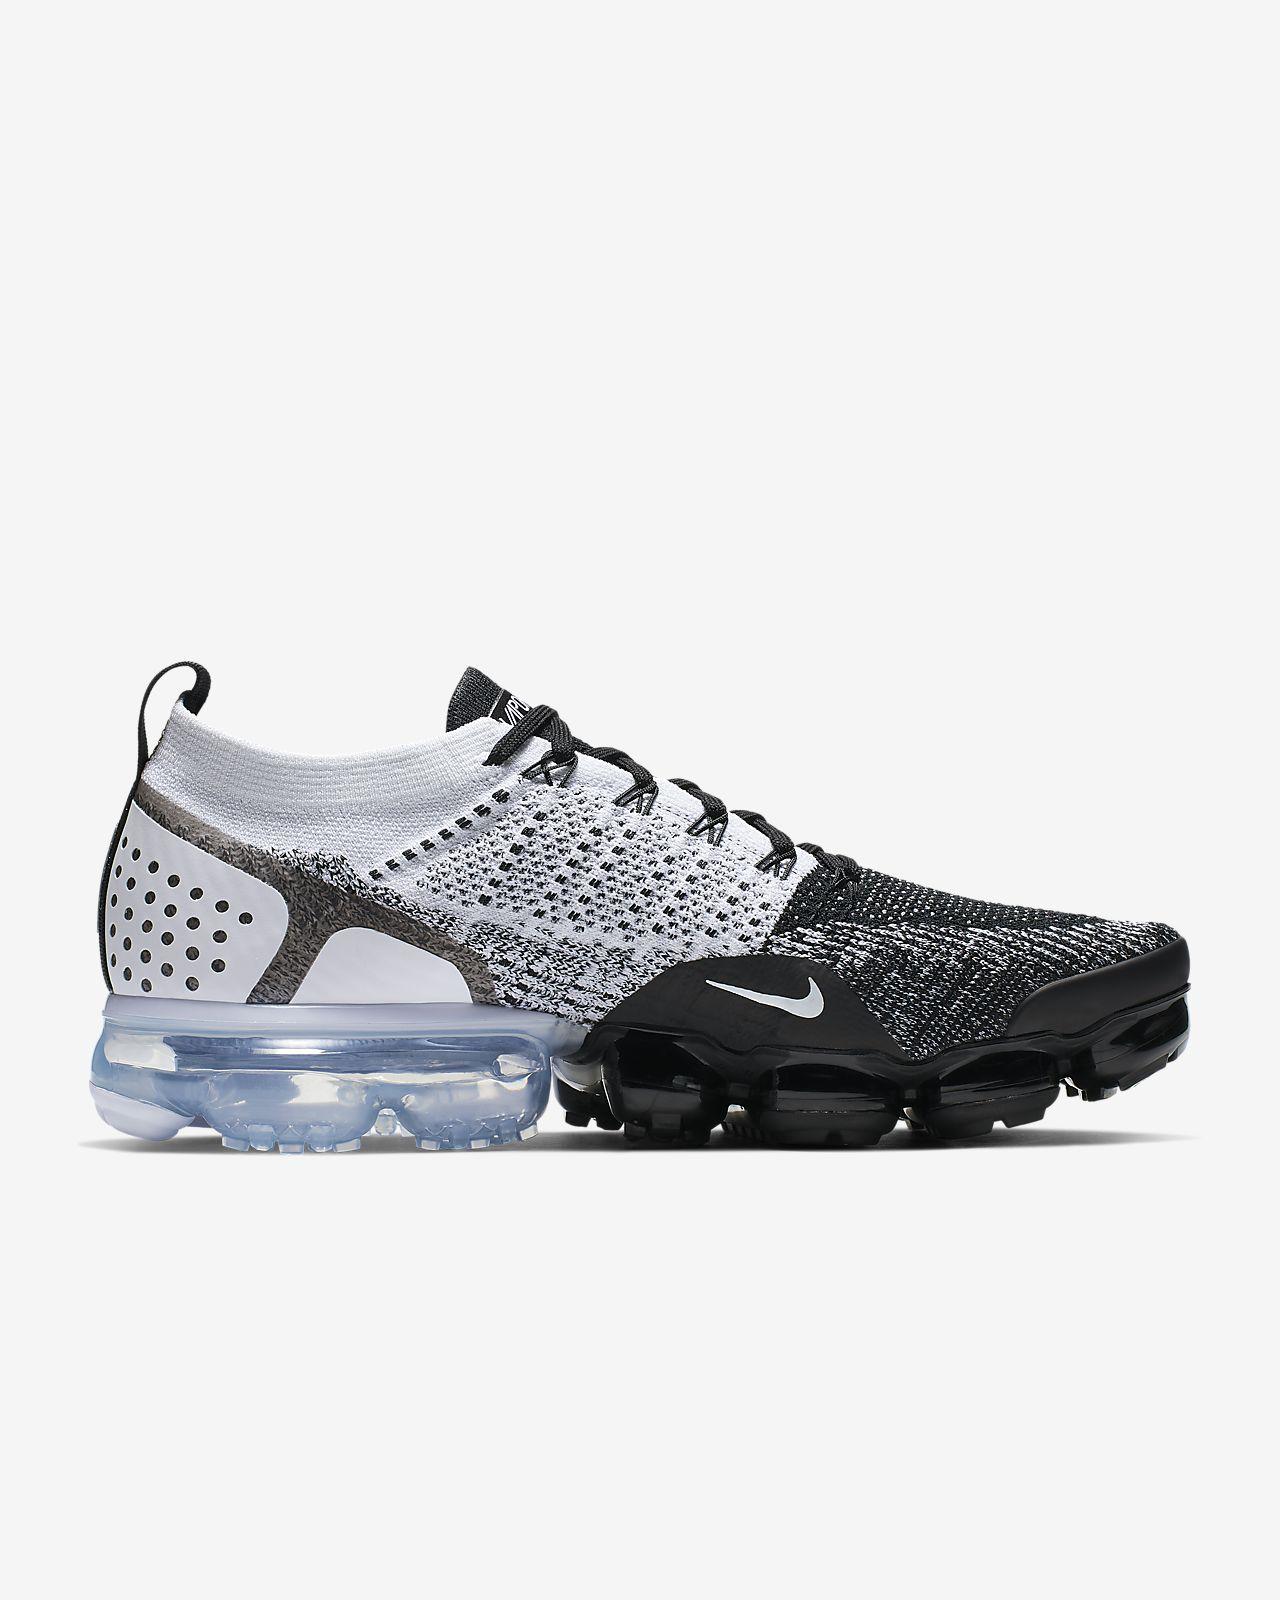 Max Doradas Air Zapatillas Nike 53ARj4L